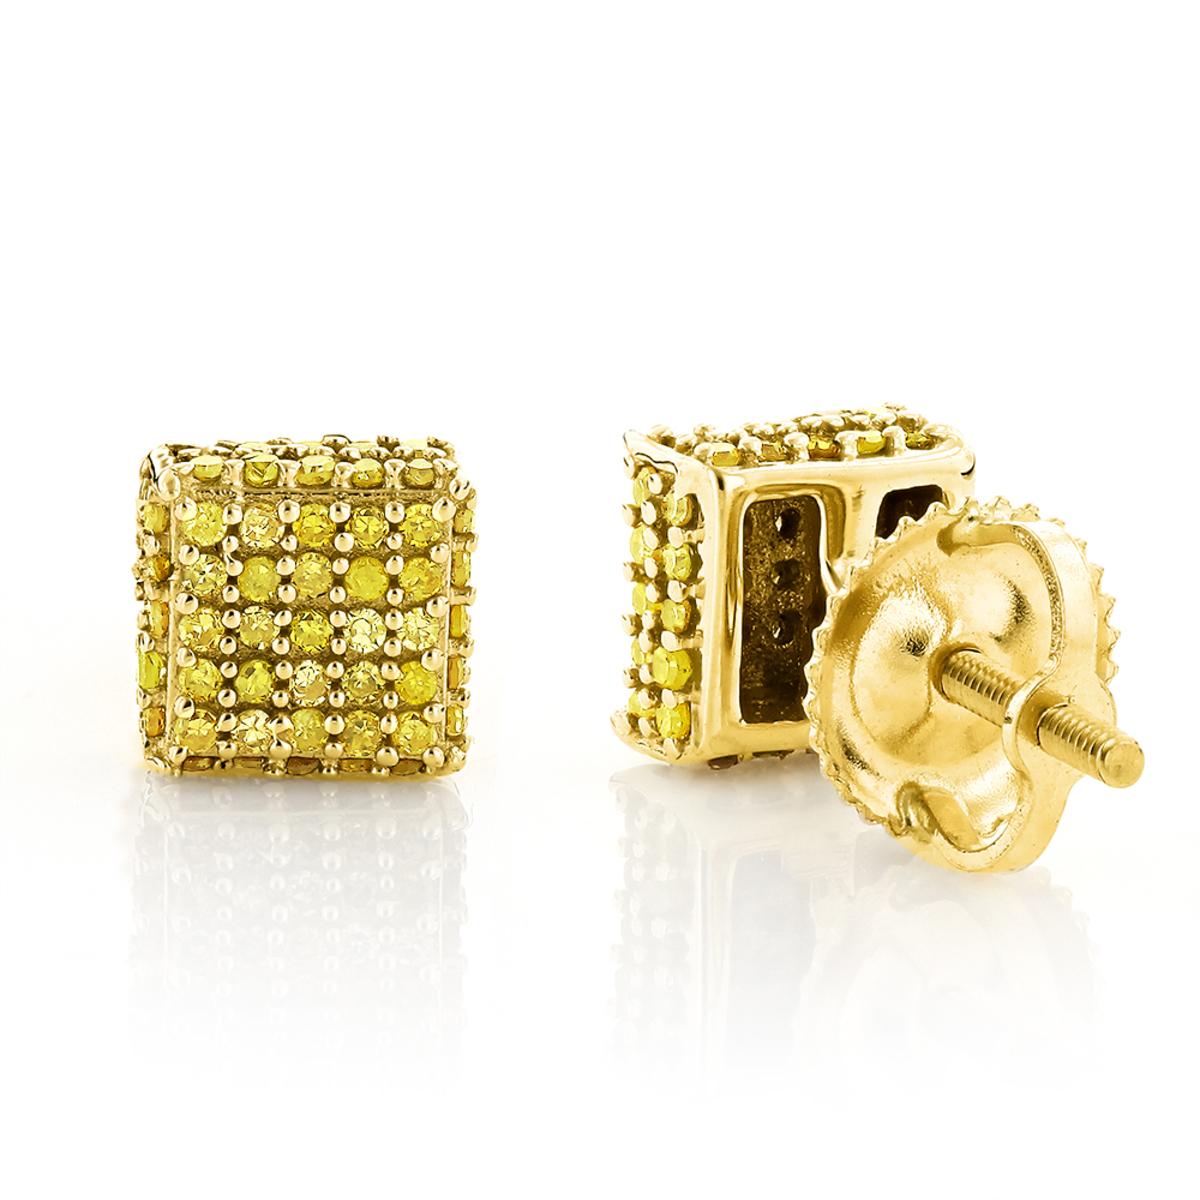 Yellow Diamond Stud Earrings 0.53ct 10K Gold